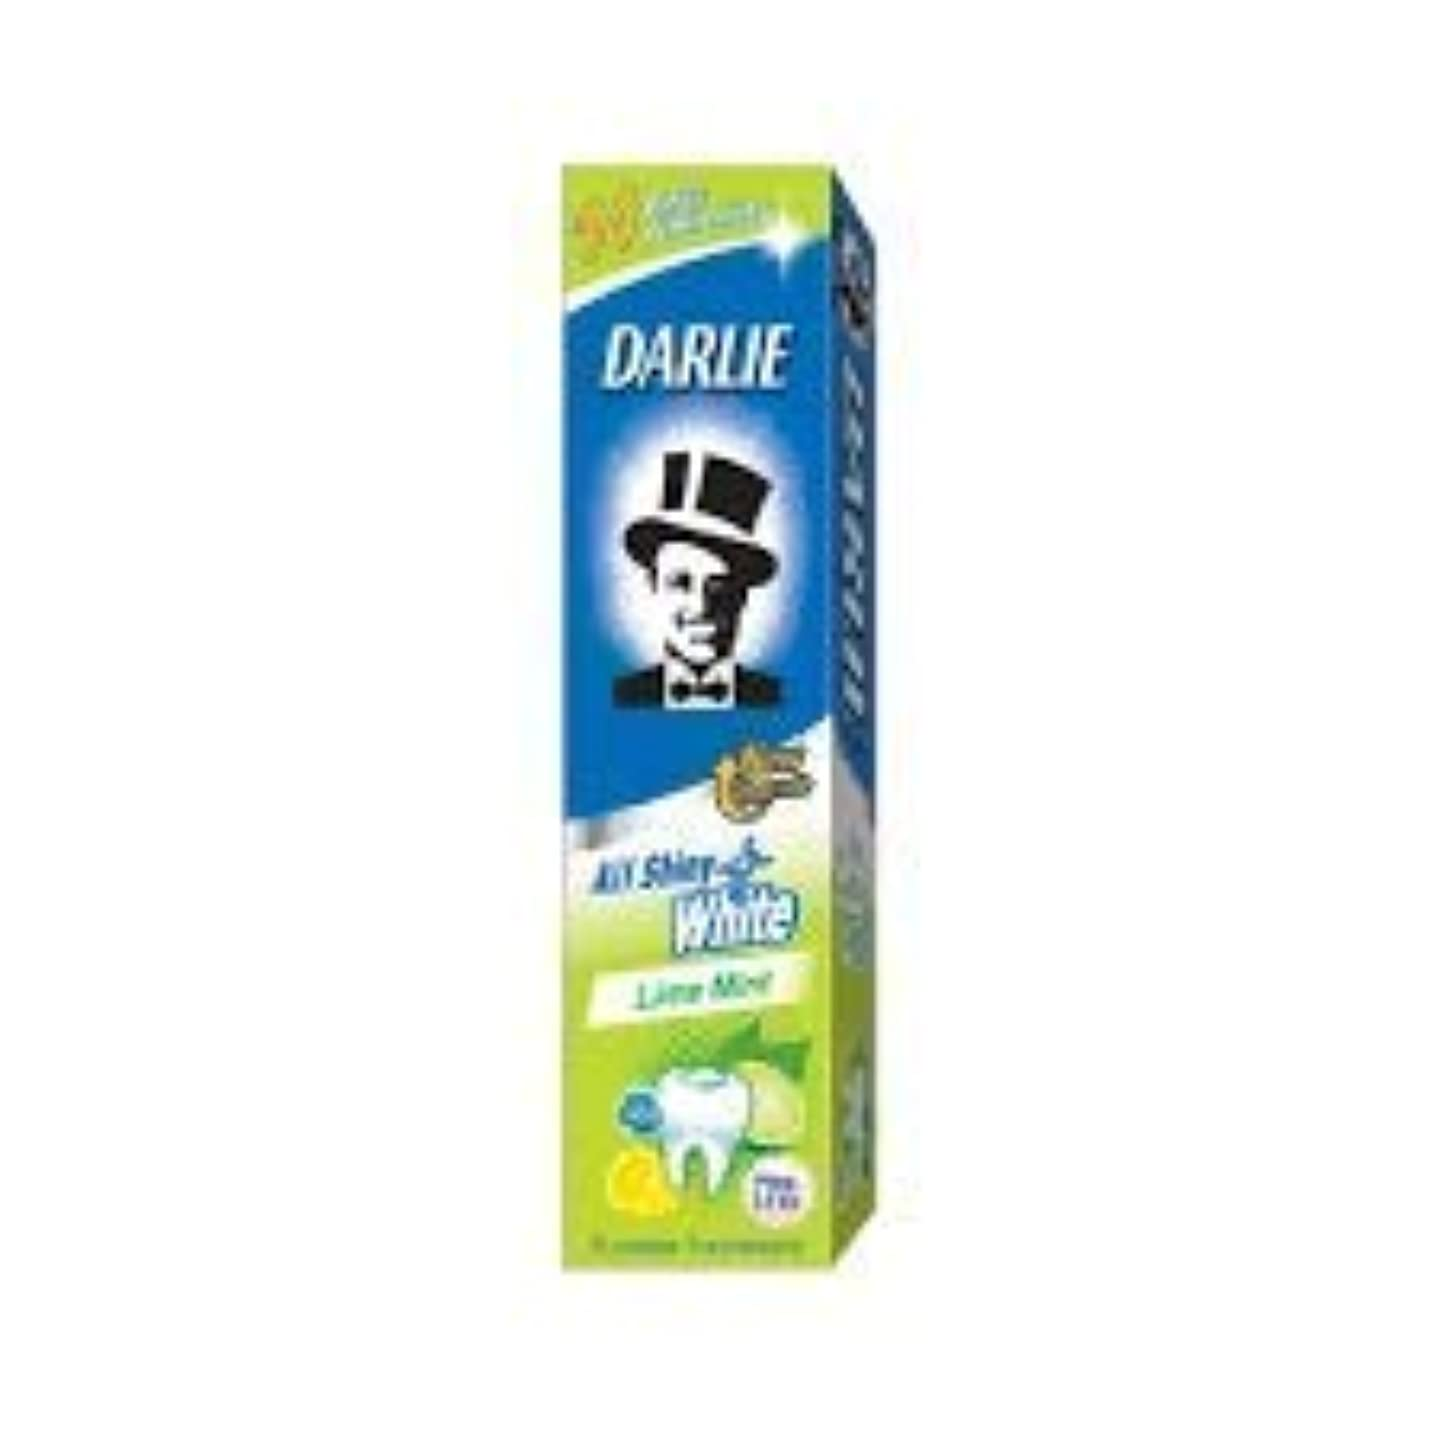 DARLIE 歯磨き粉すべての光沢のあるホワイトライムミント140g - 虫歯と戦い、歯を保護するフッ化物を含みます